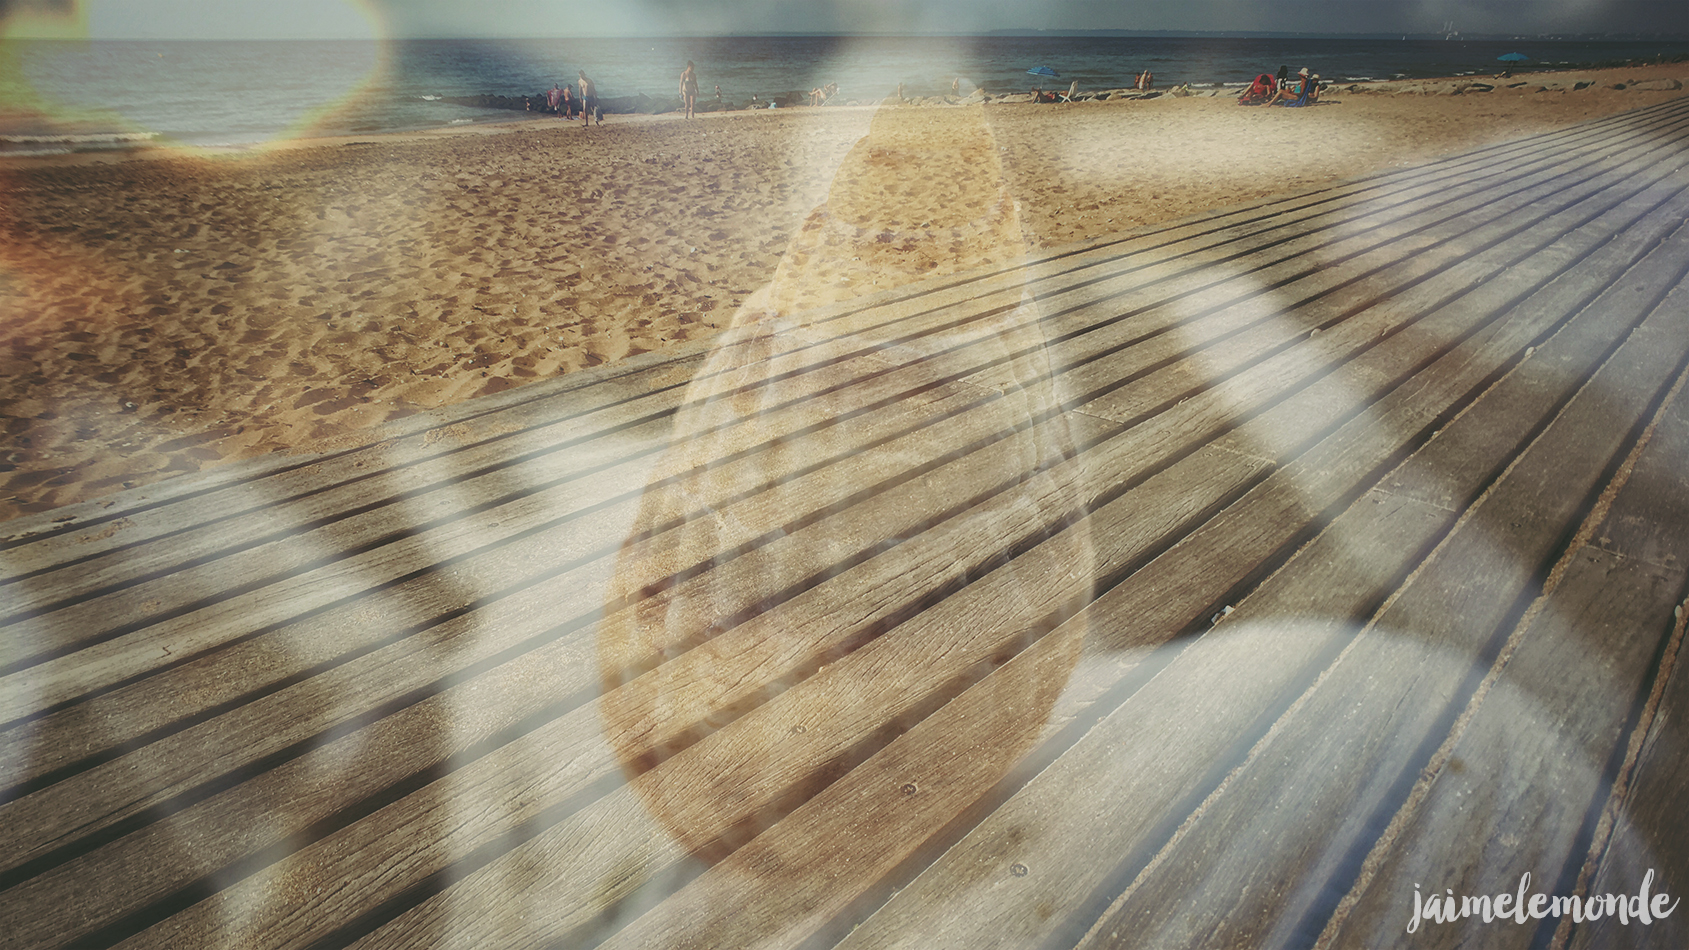 Pixter - Double exposition Snapseed - Blonville sur mer - ©jaimelemonde (9)